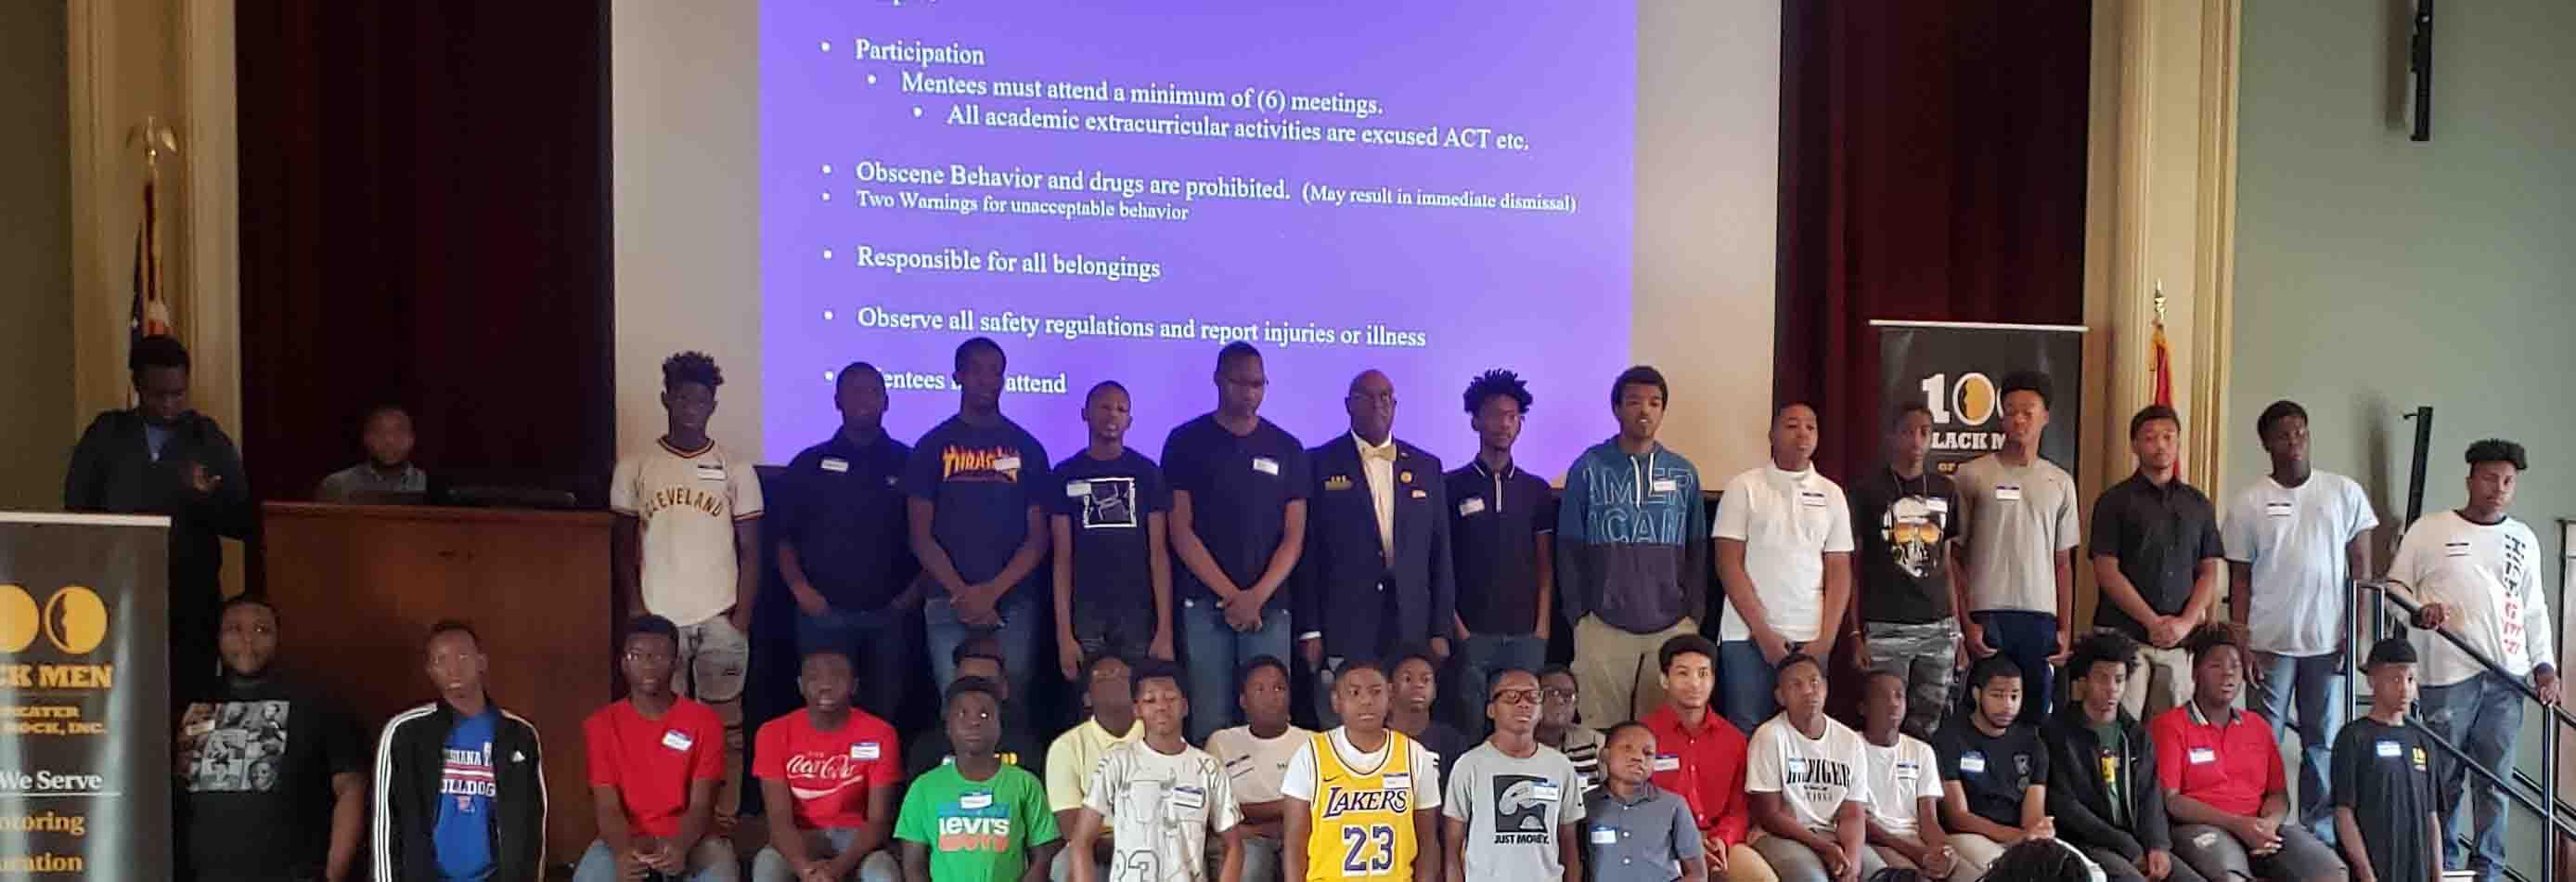 100 Black Men Orientation – The Kids